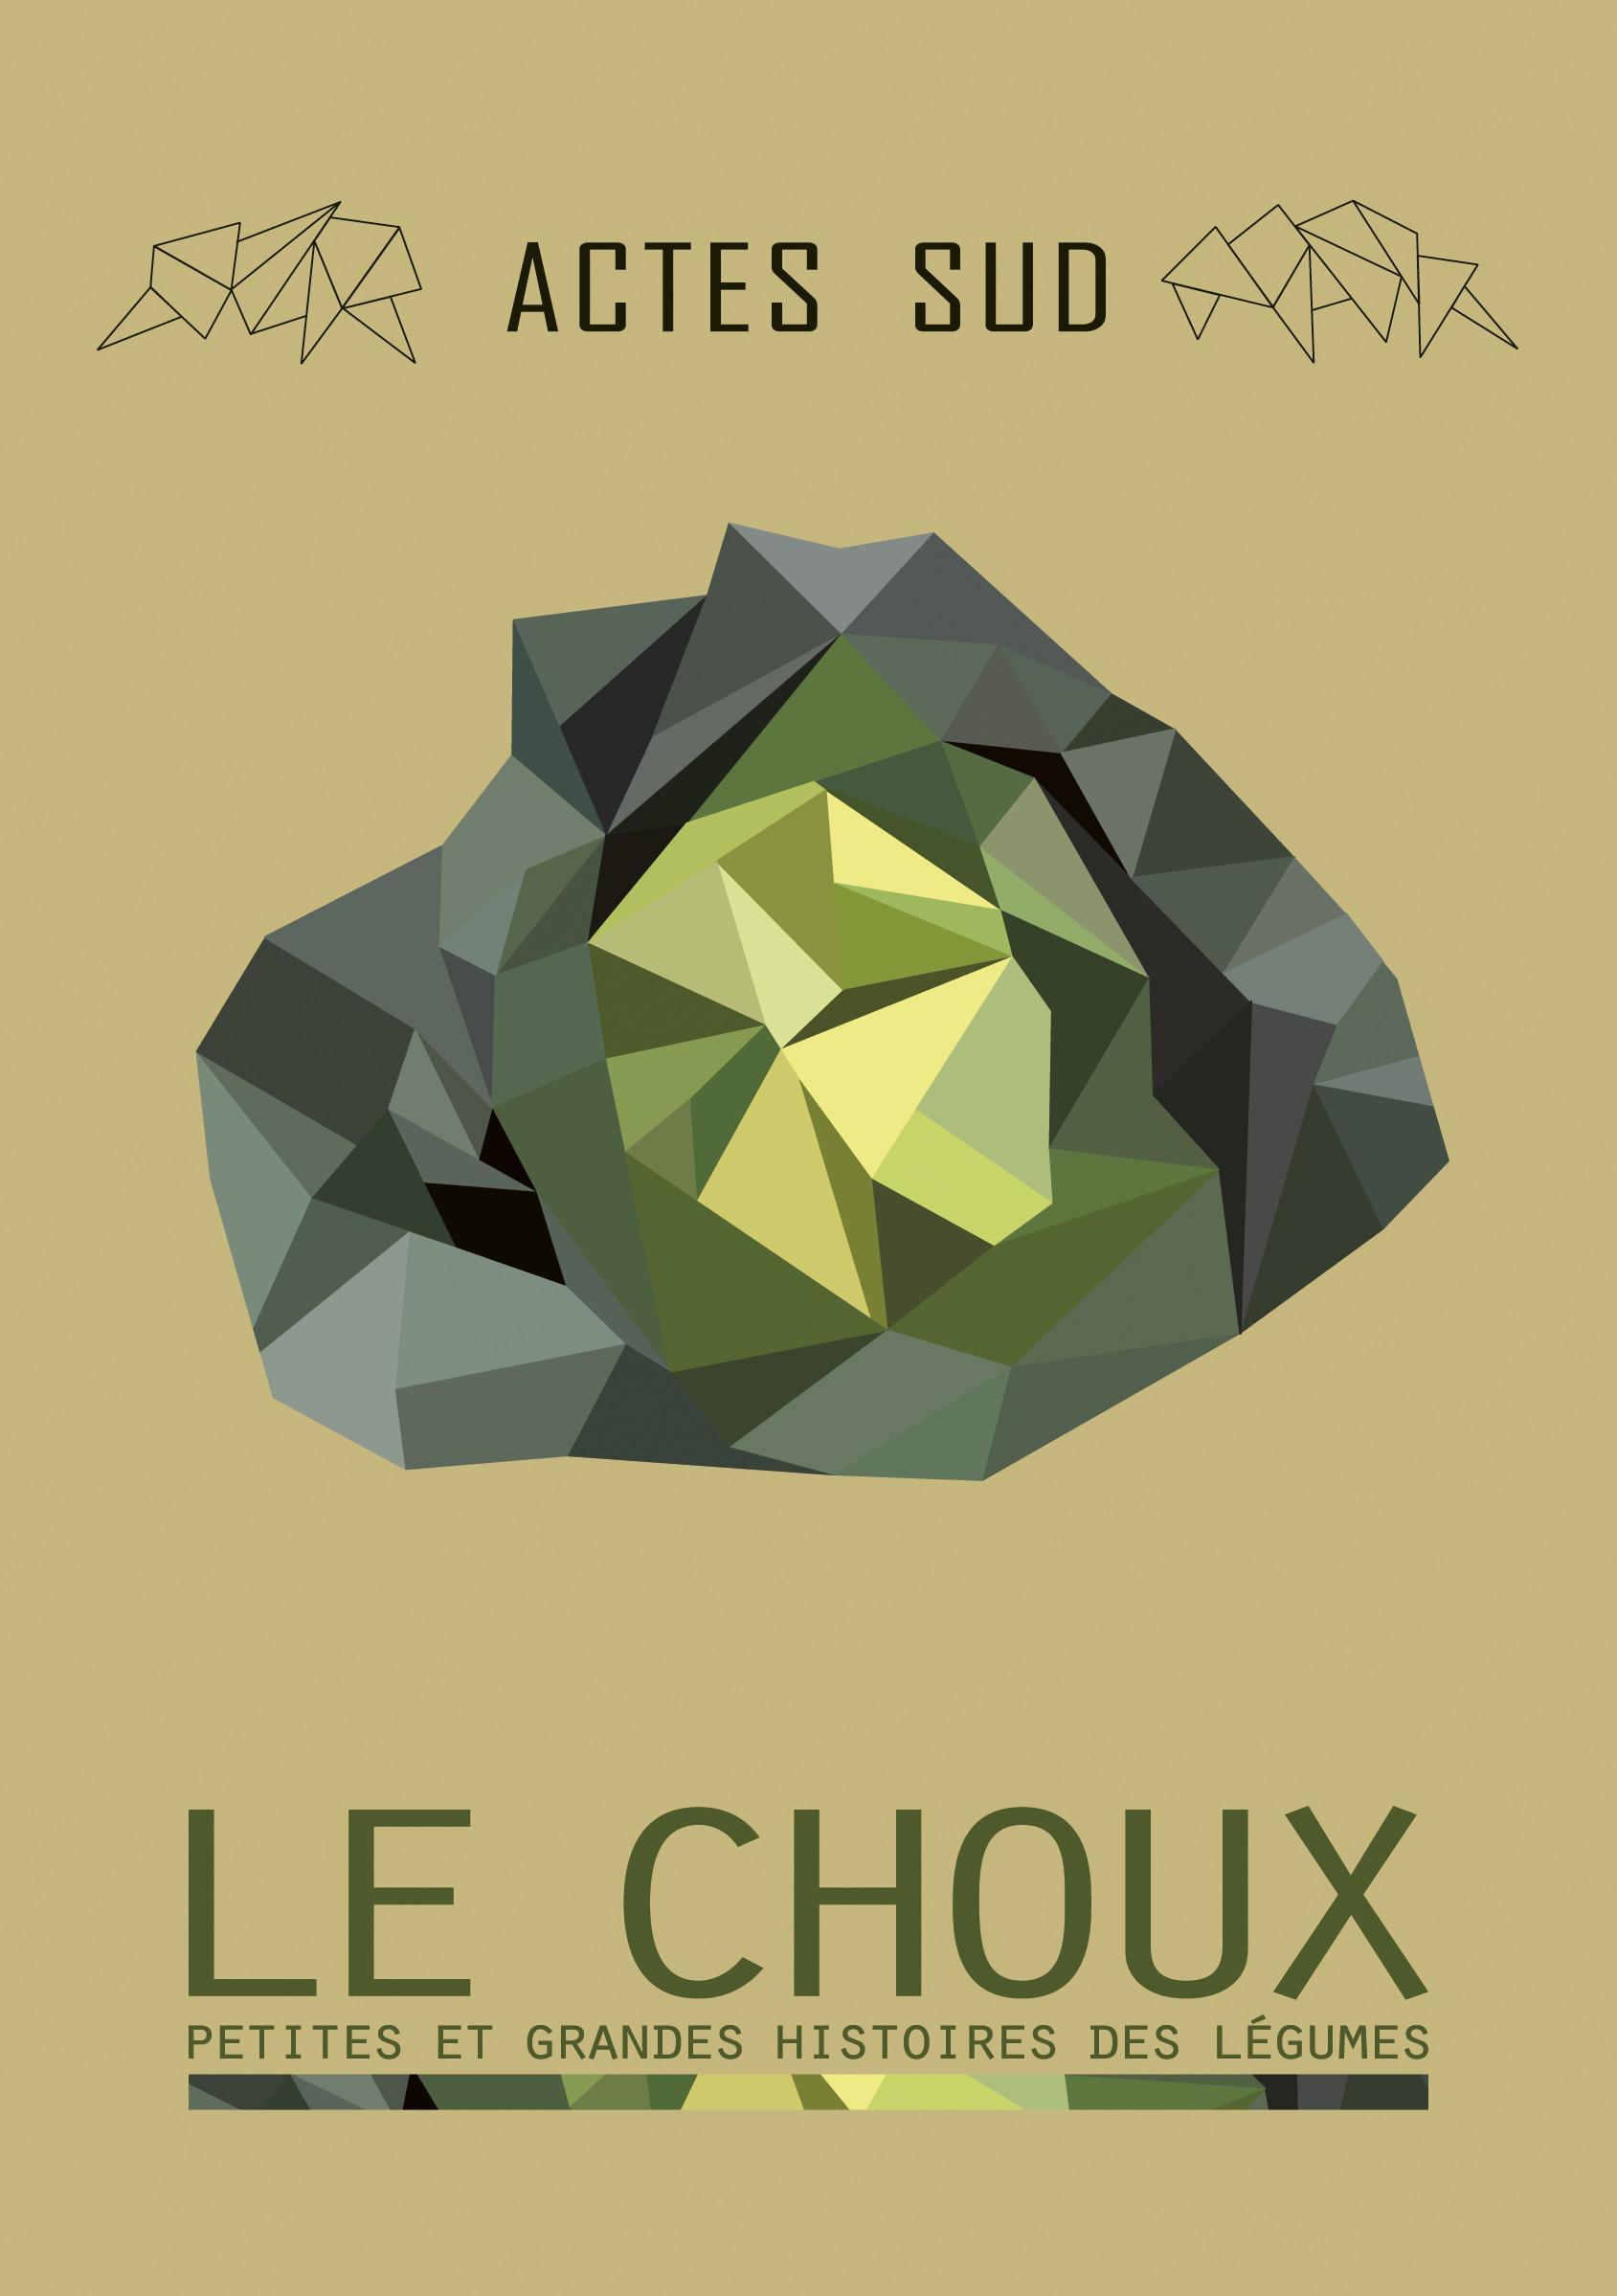 LE CHOUX.indd